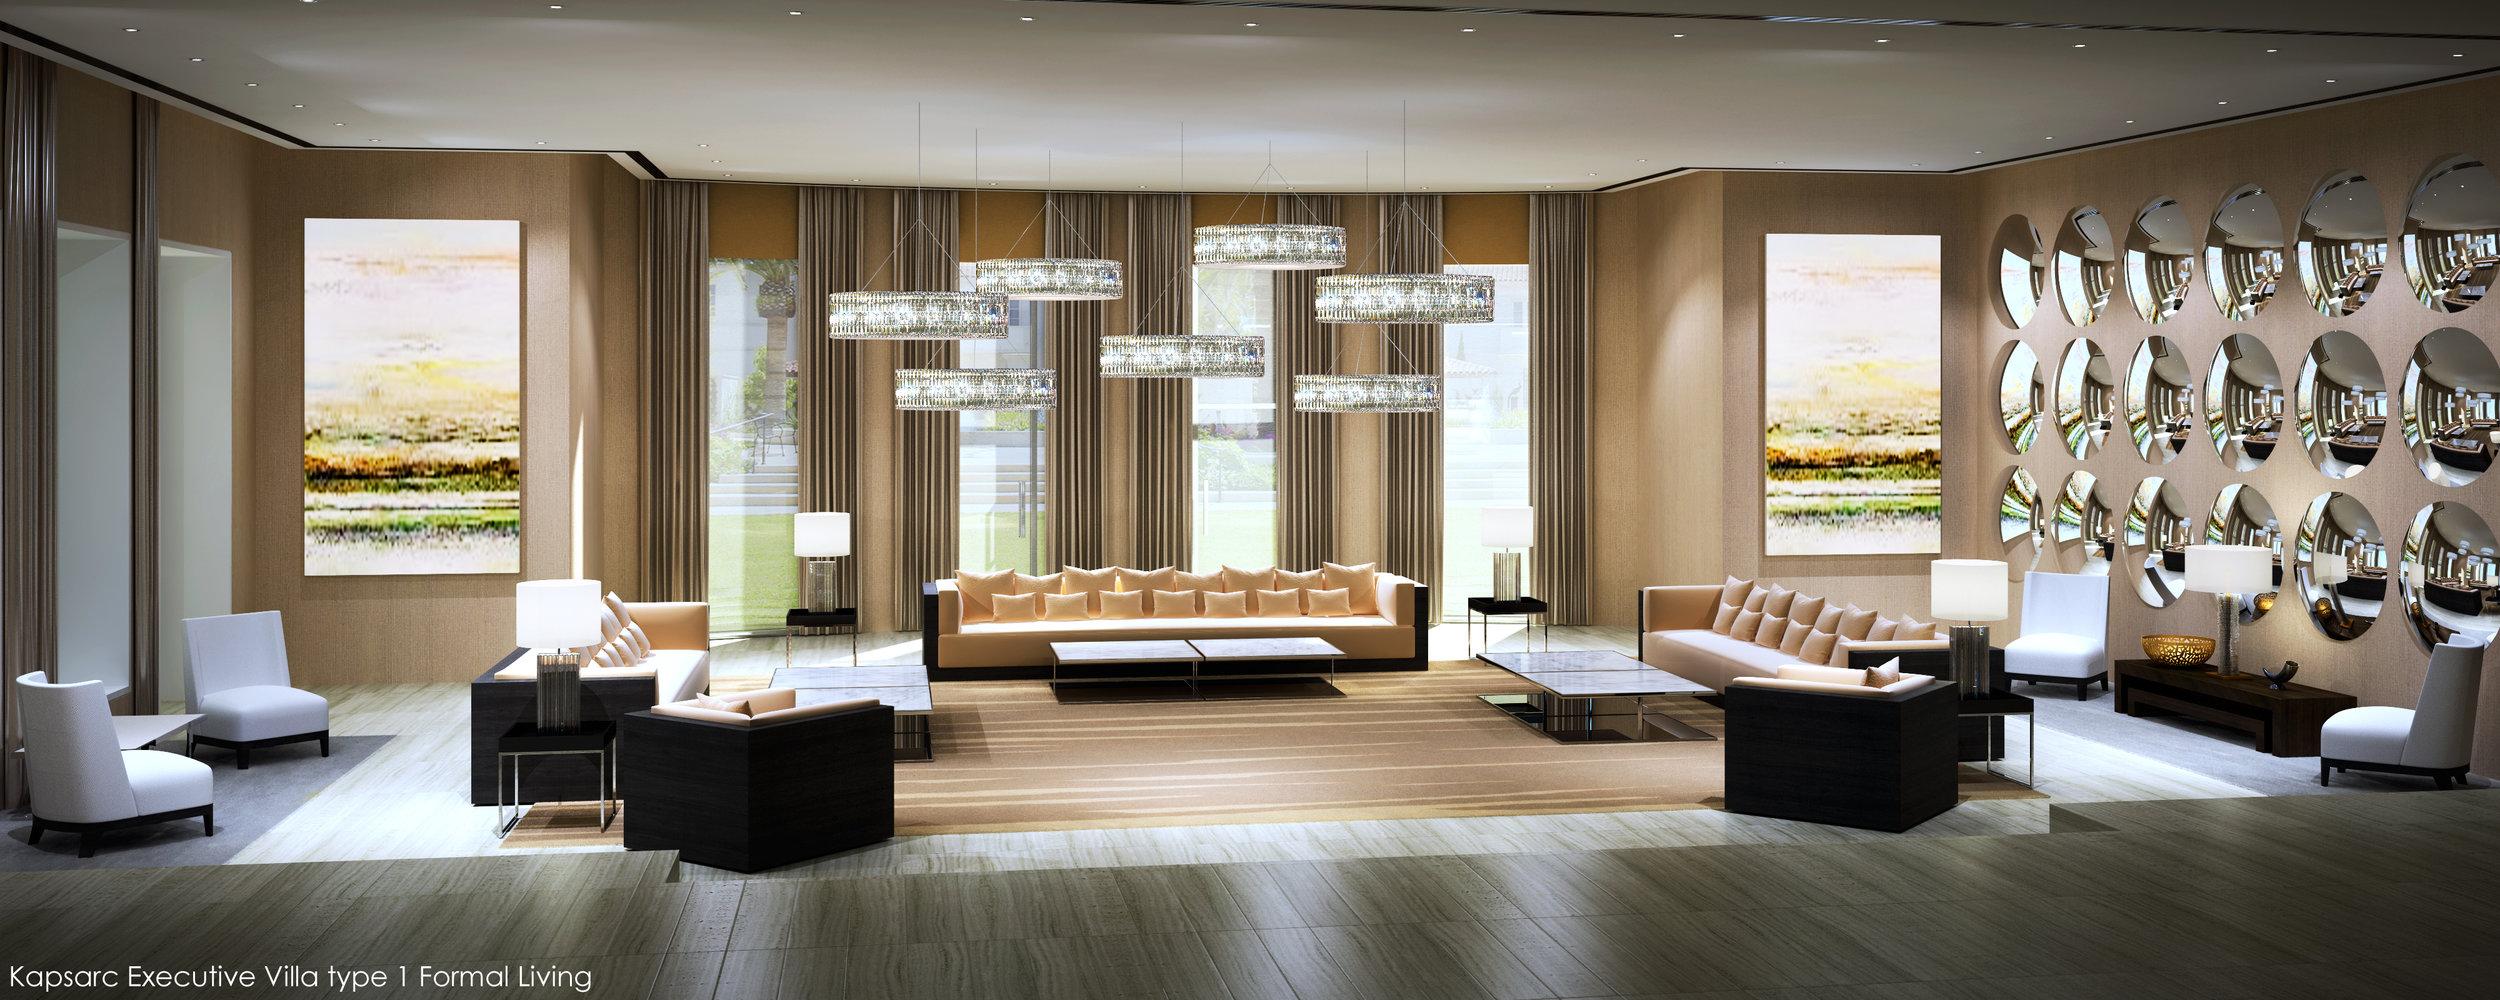 Kapsarc Executive Villa type 1 Formal Living.jpg